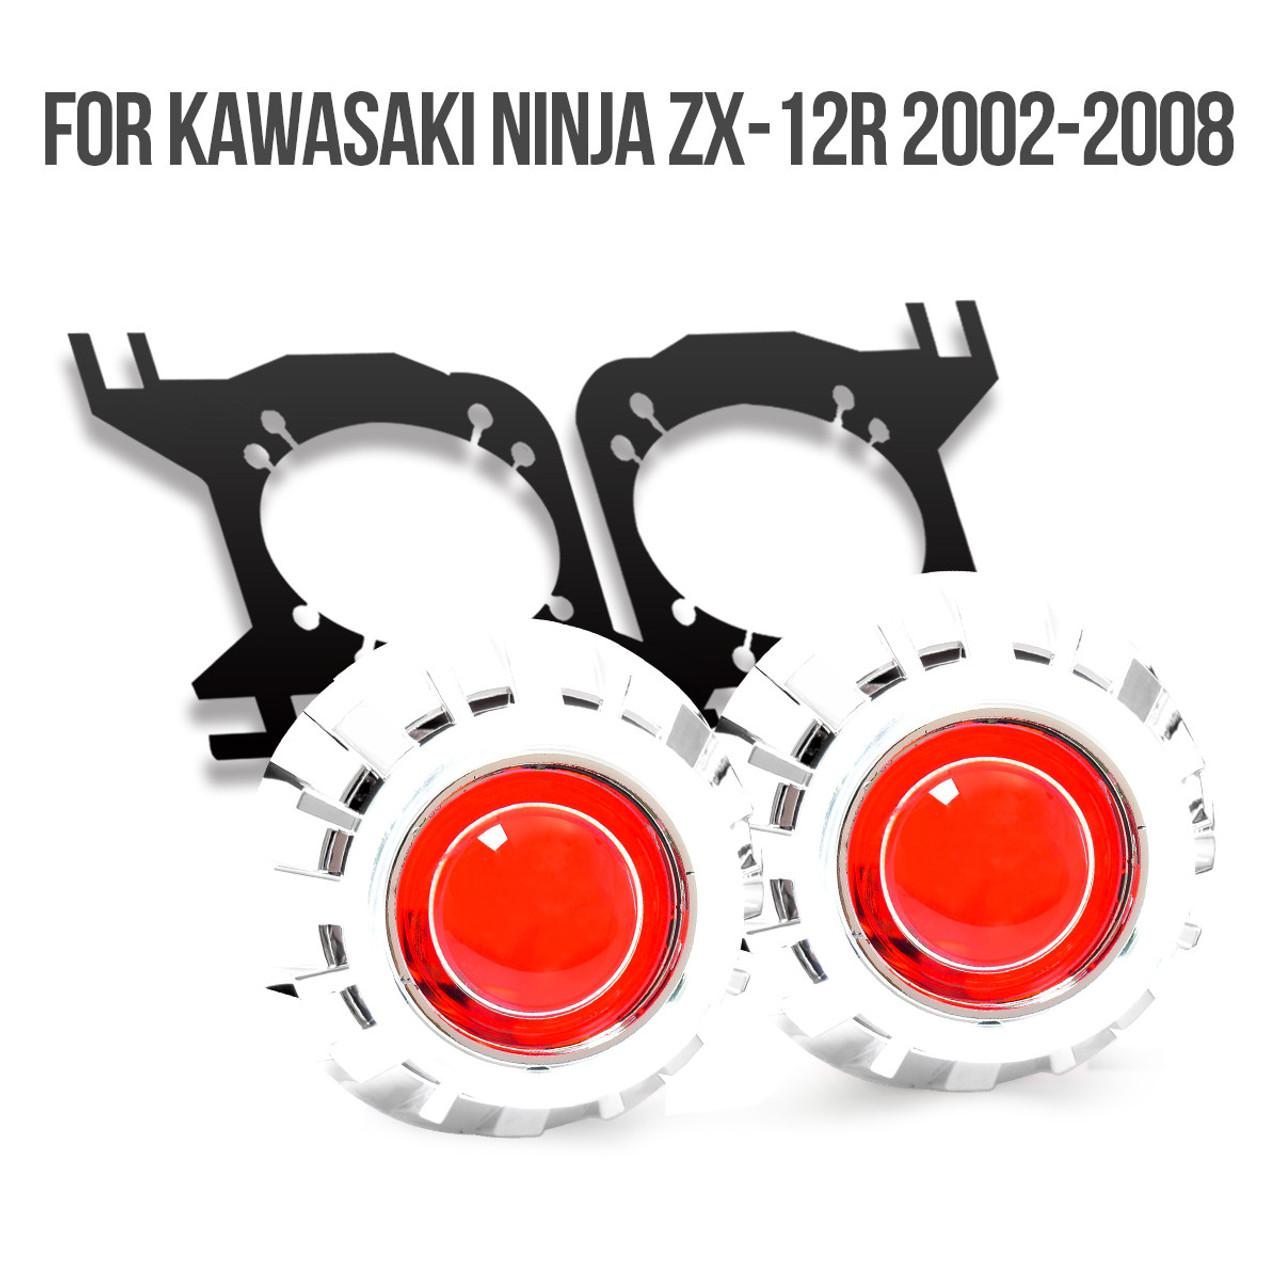 fit for kawasaki ninja zx 12r 2002 2008 tailor made hid projector kit hp35 2000 Kawasaki ZX-12R Parts